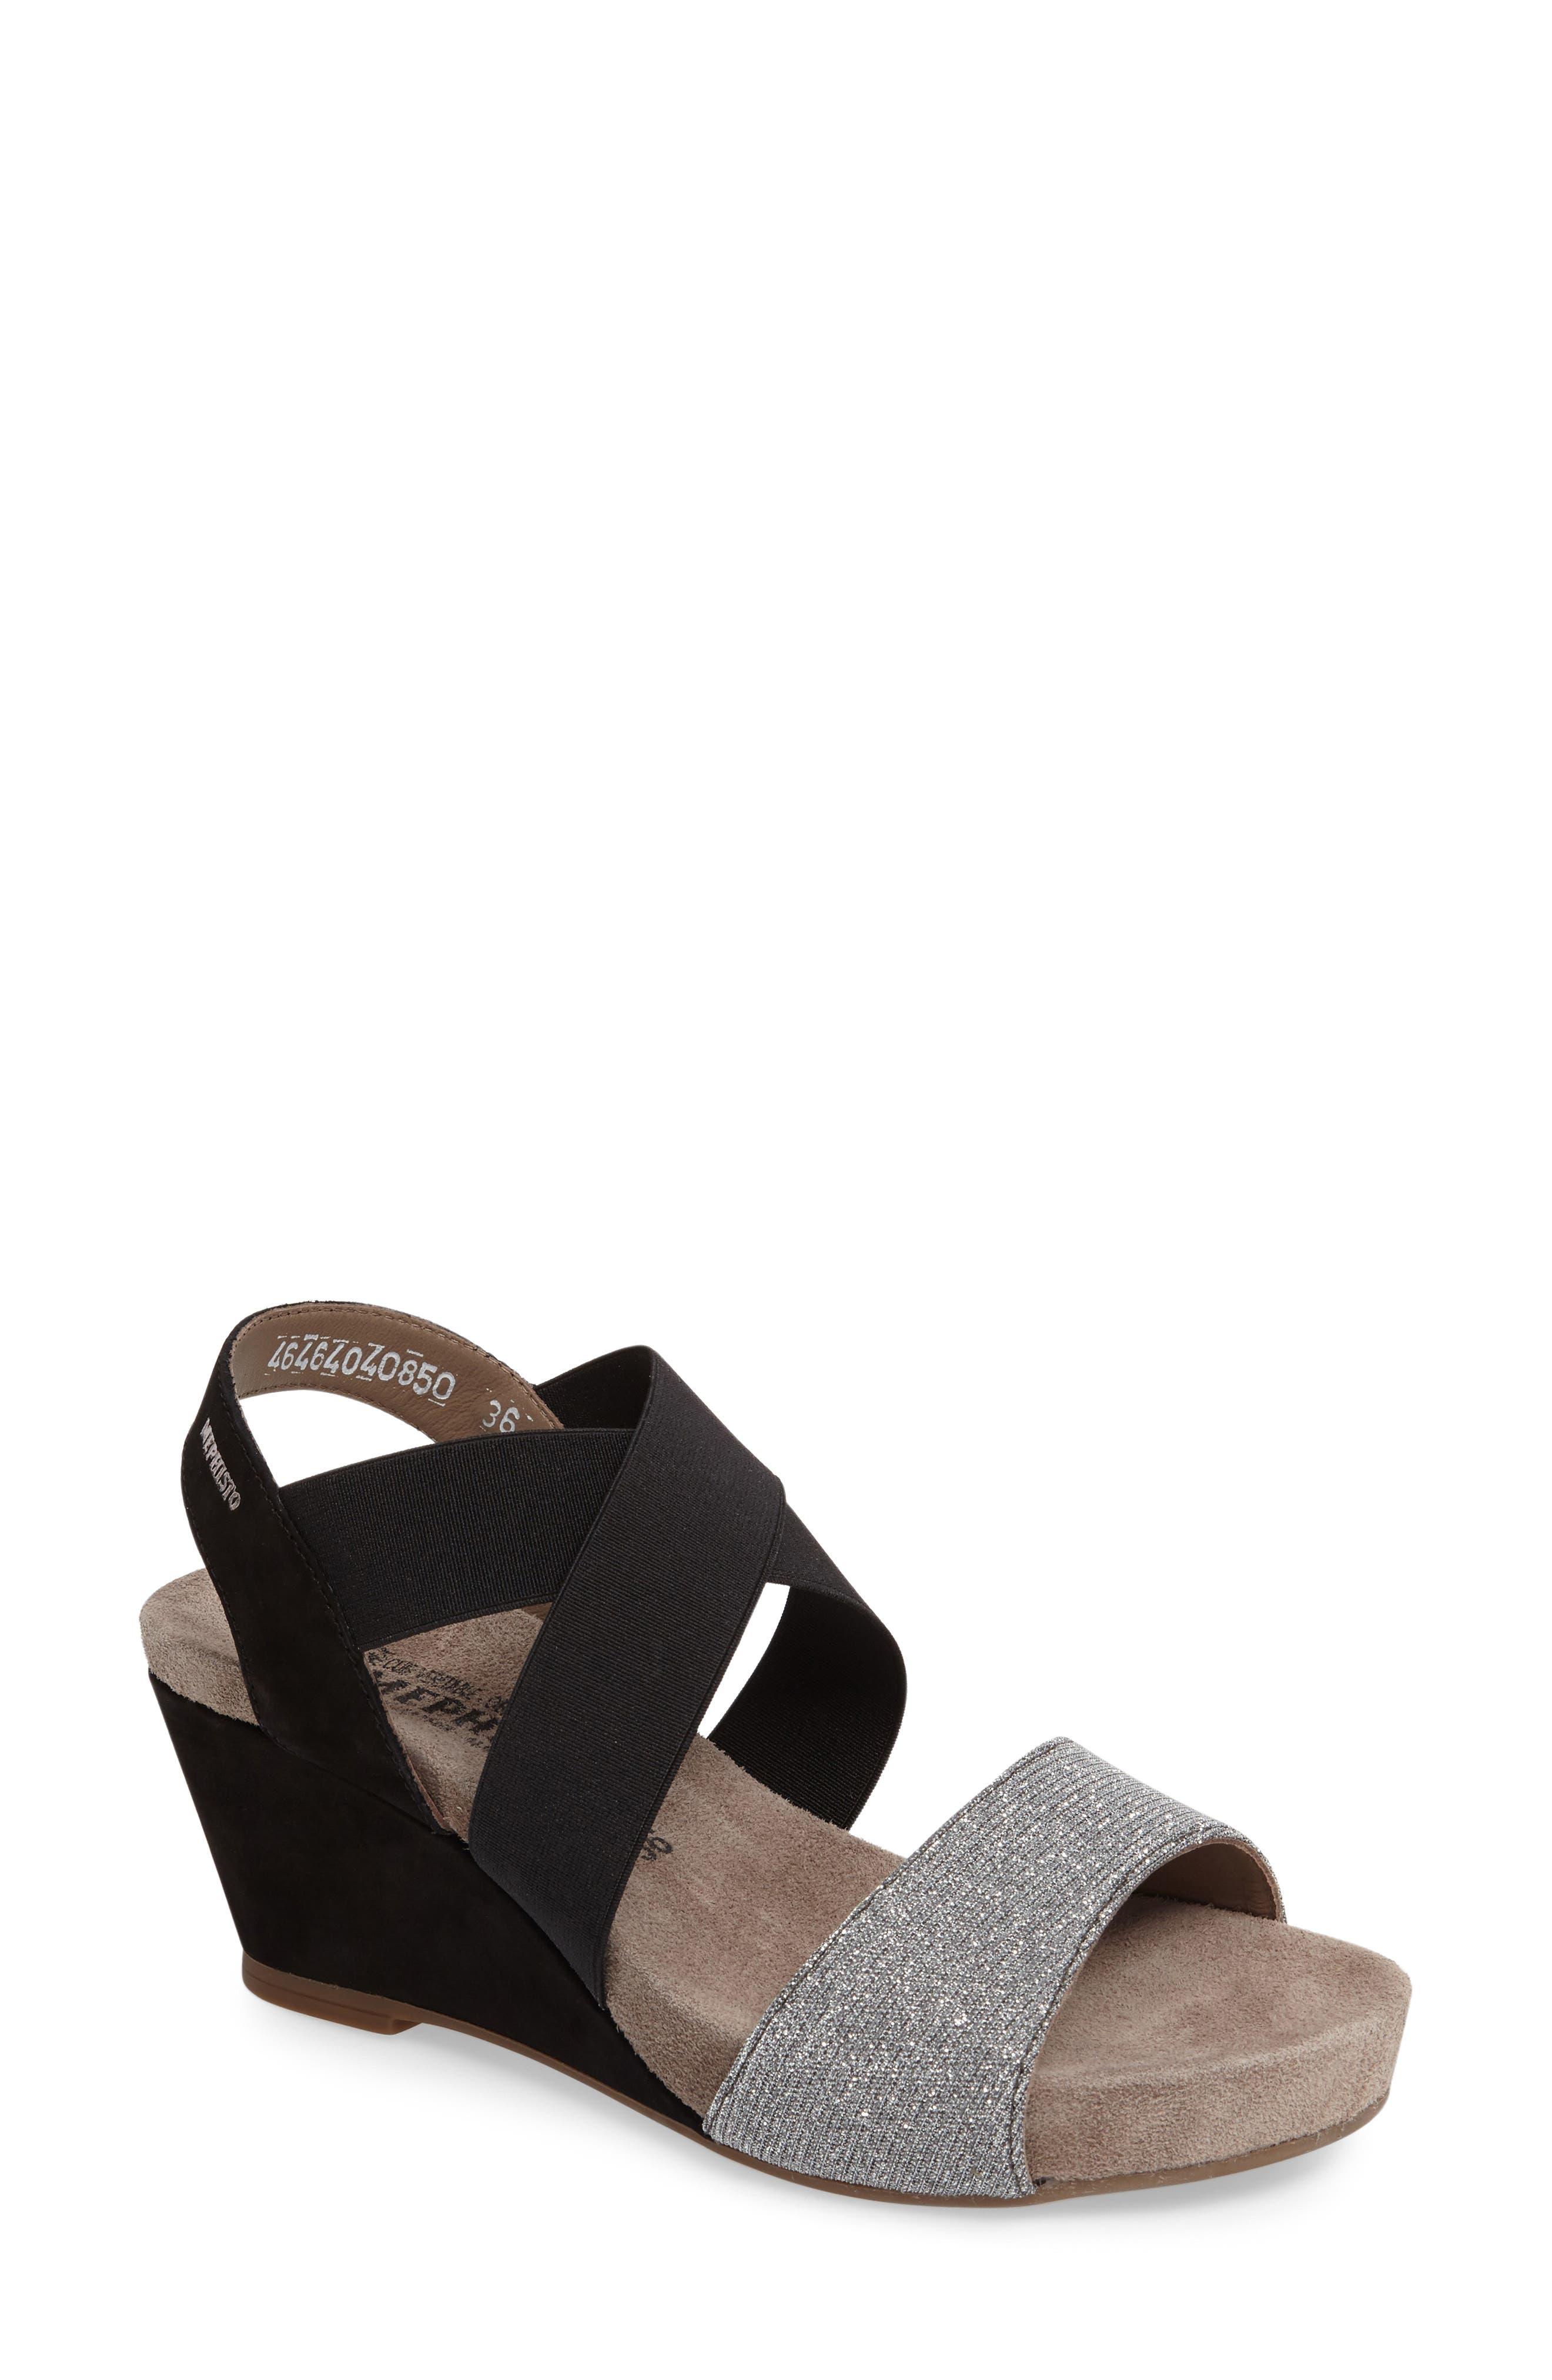 'Barbara' Wedge Sandal,                         Main,                         color, BLACK BUCKSOFT LEATHER